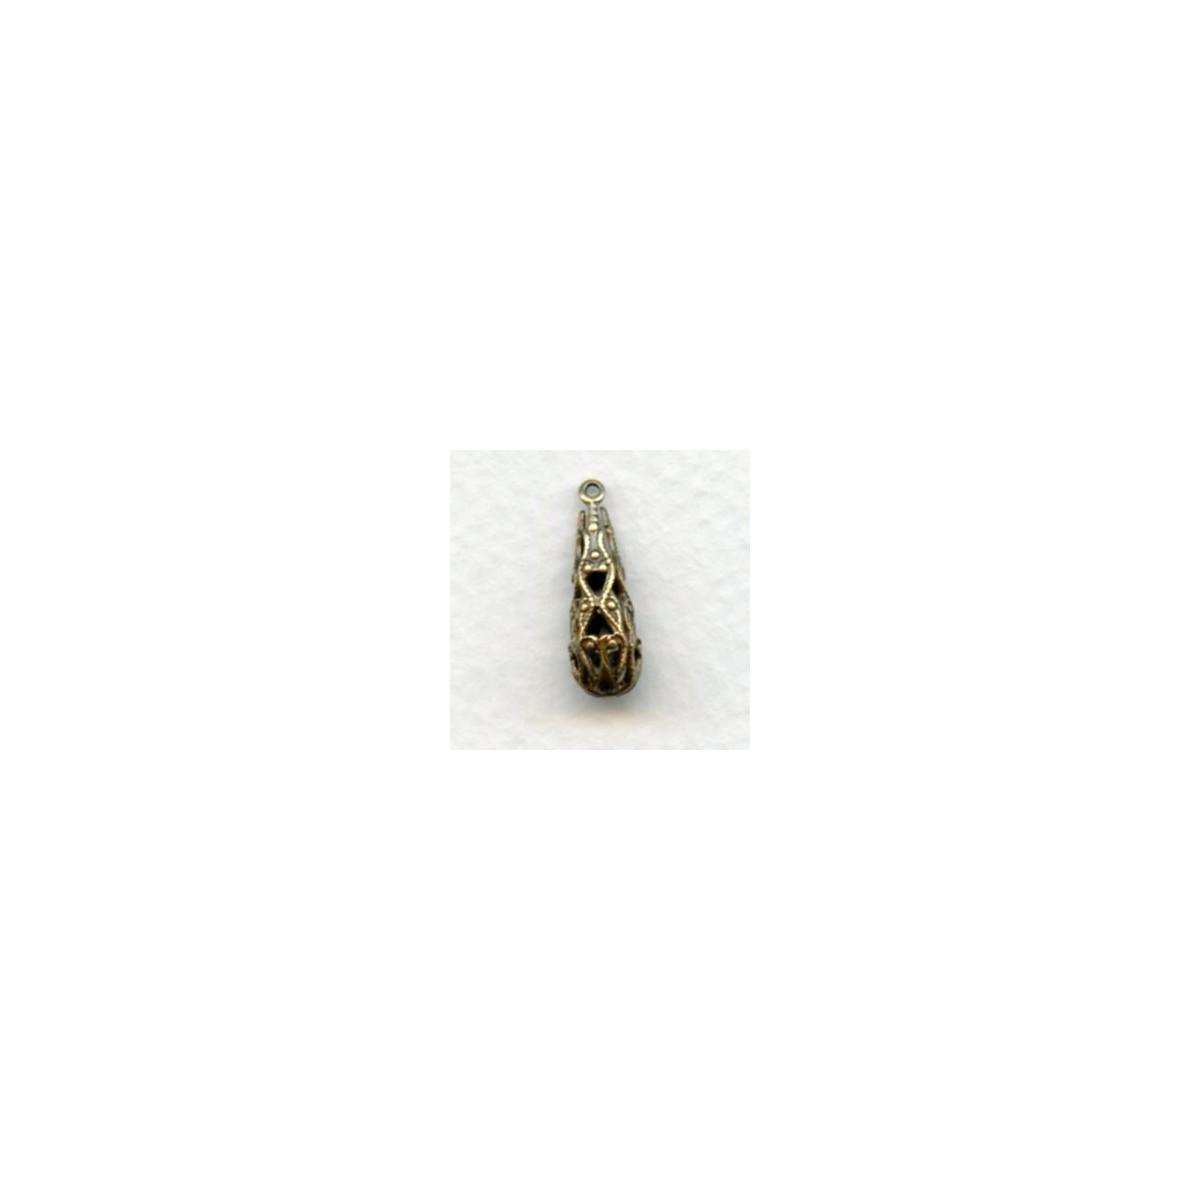 Filigree Teardrop Shape Oxidized Brass Beads 19x6mm